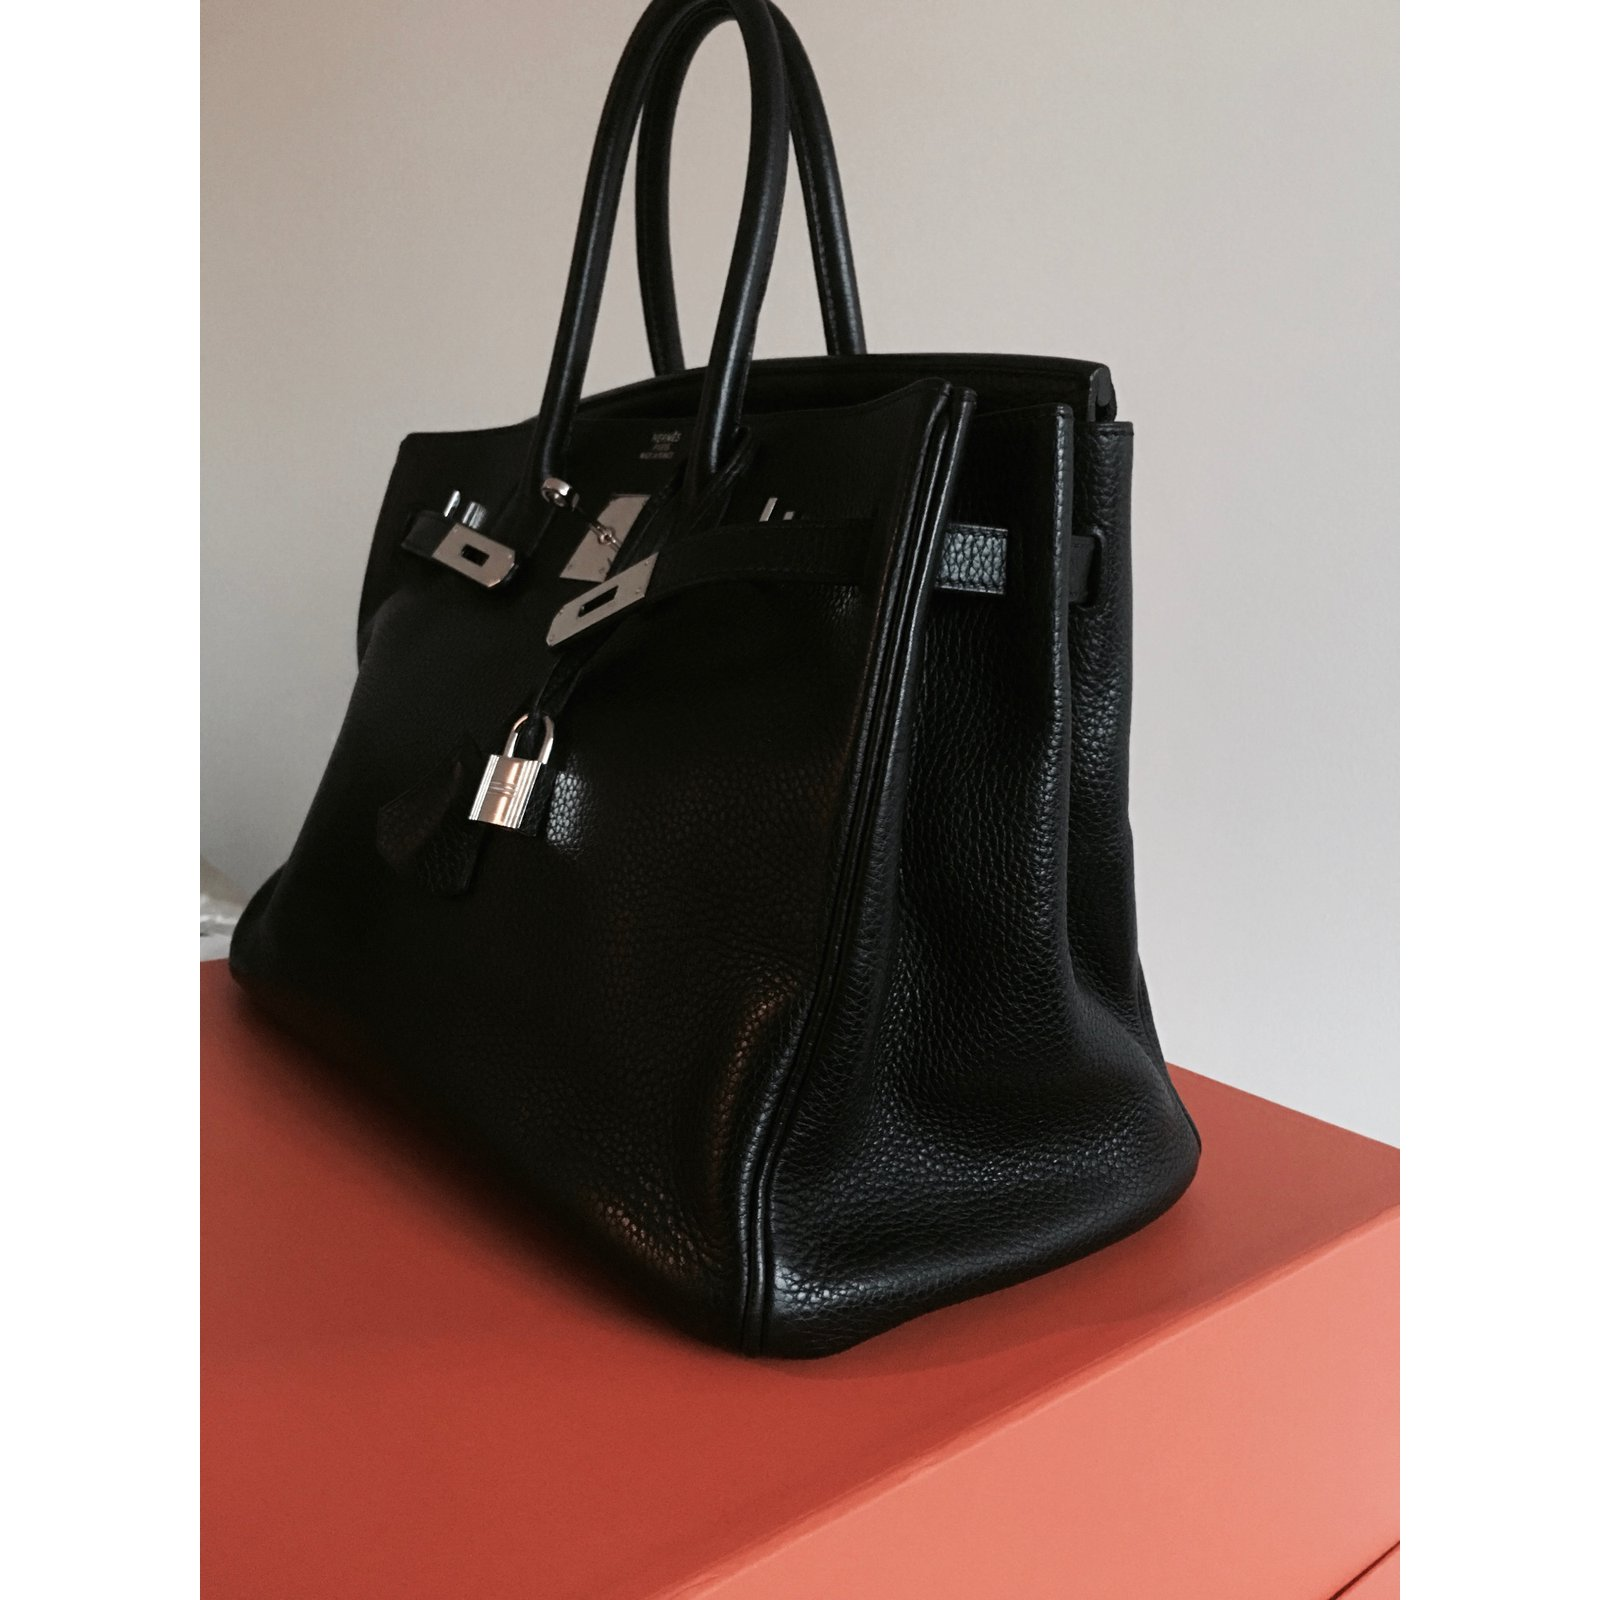 Sacs à main Hermès Sac HERMES Birkin cuir Togo noir 35 cm Cuir Noir  ref.35226 - Joli Closet 1369596c6d3